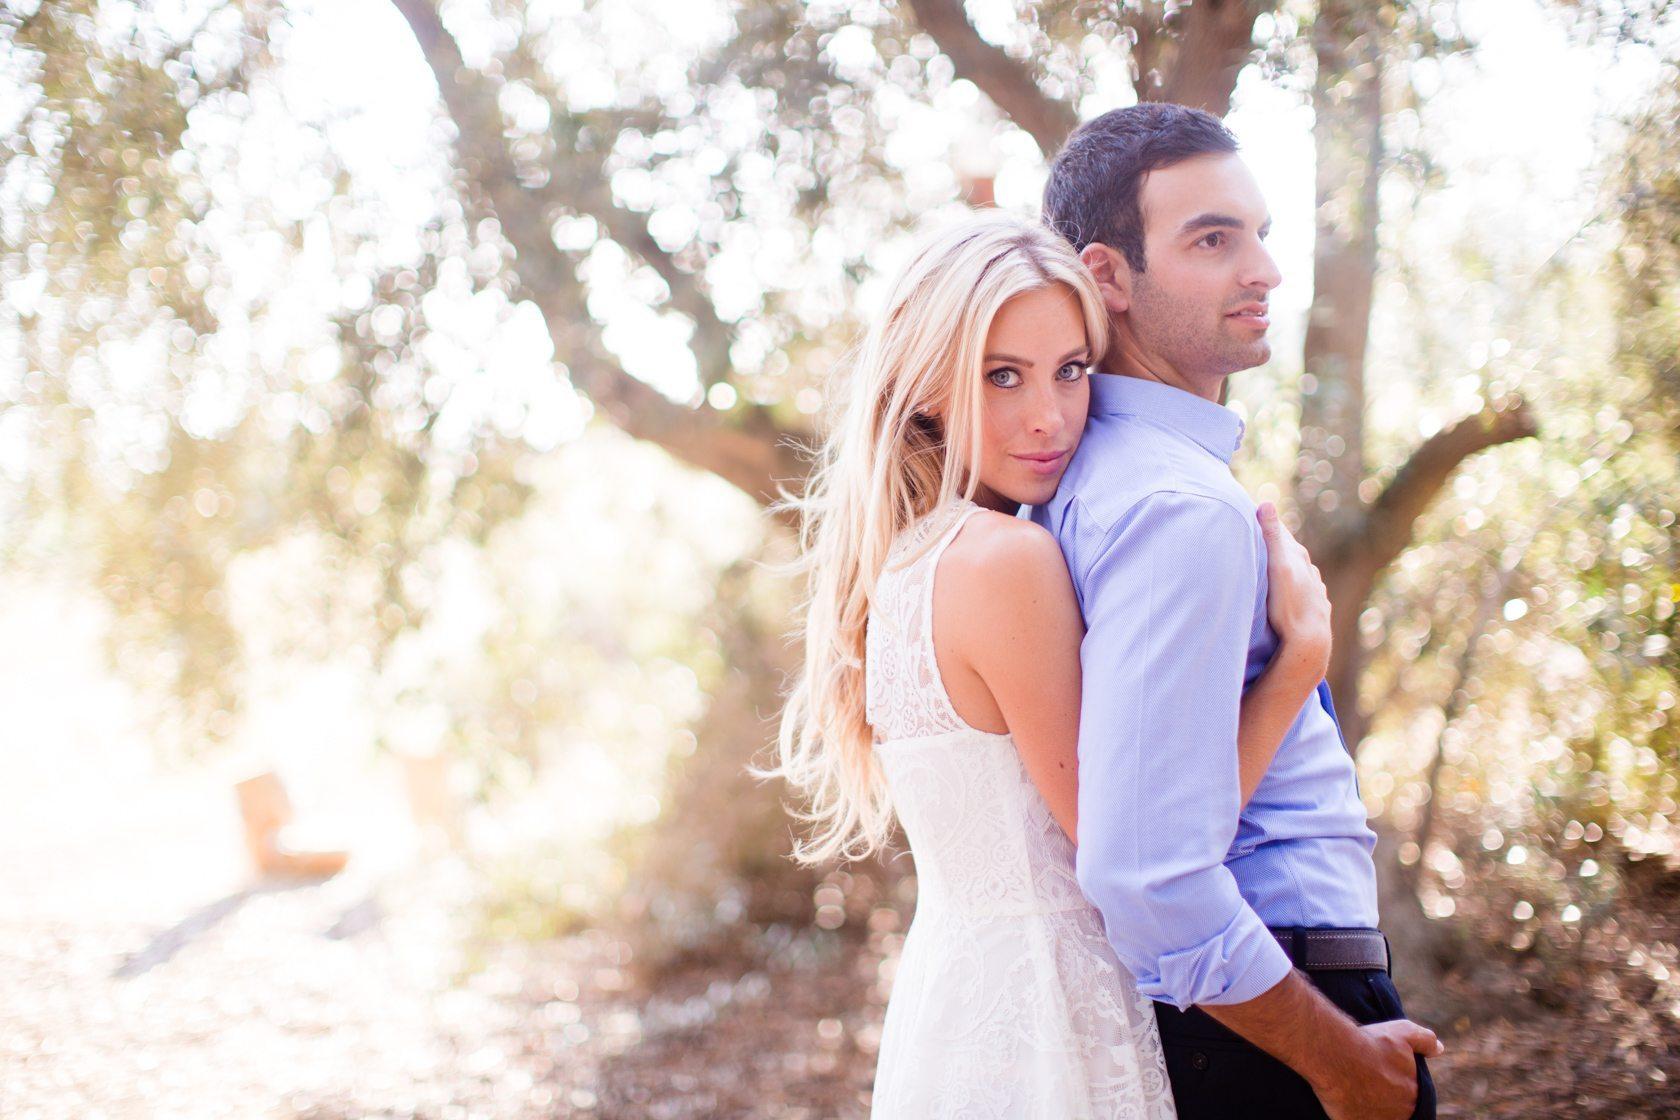 Highland_Springs_Lavender_Field_Engagement_10.jpg